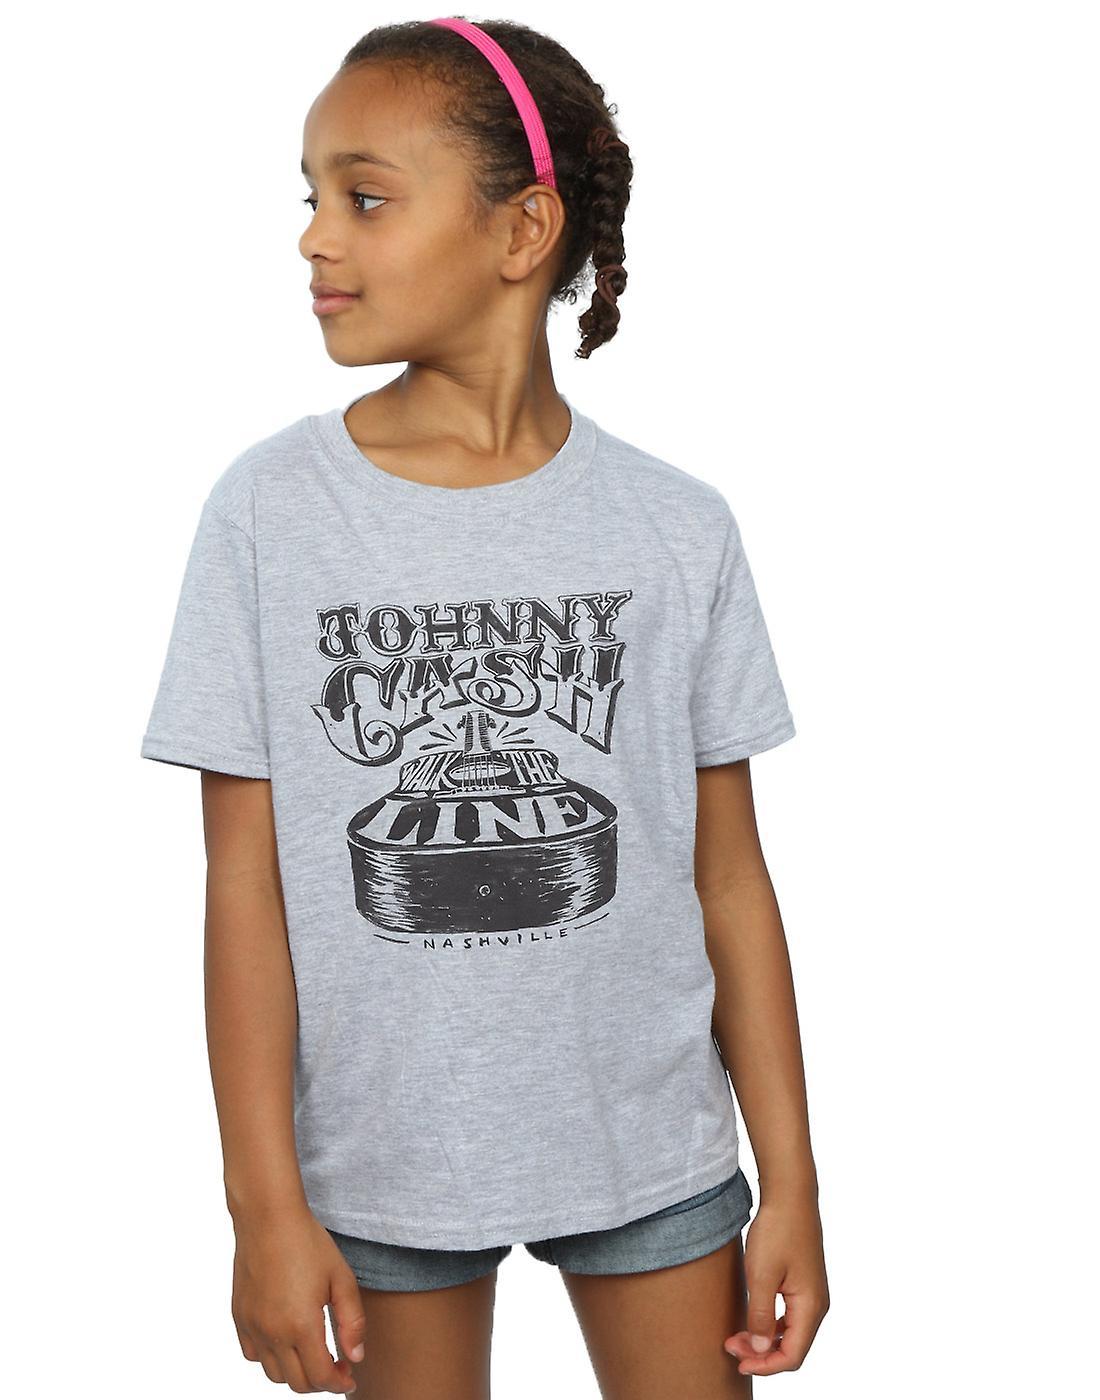 Johnny Cash Girls Nashville Guitar T-Shirt